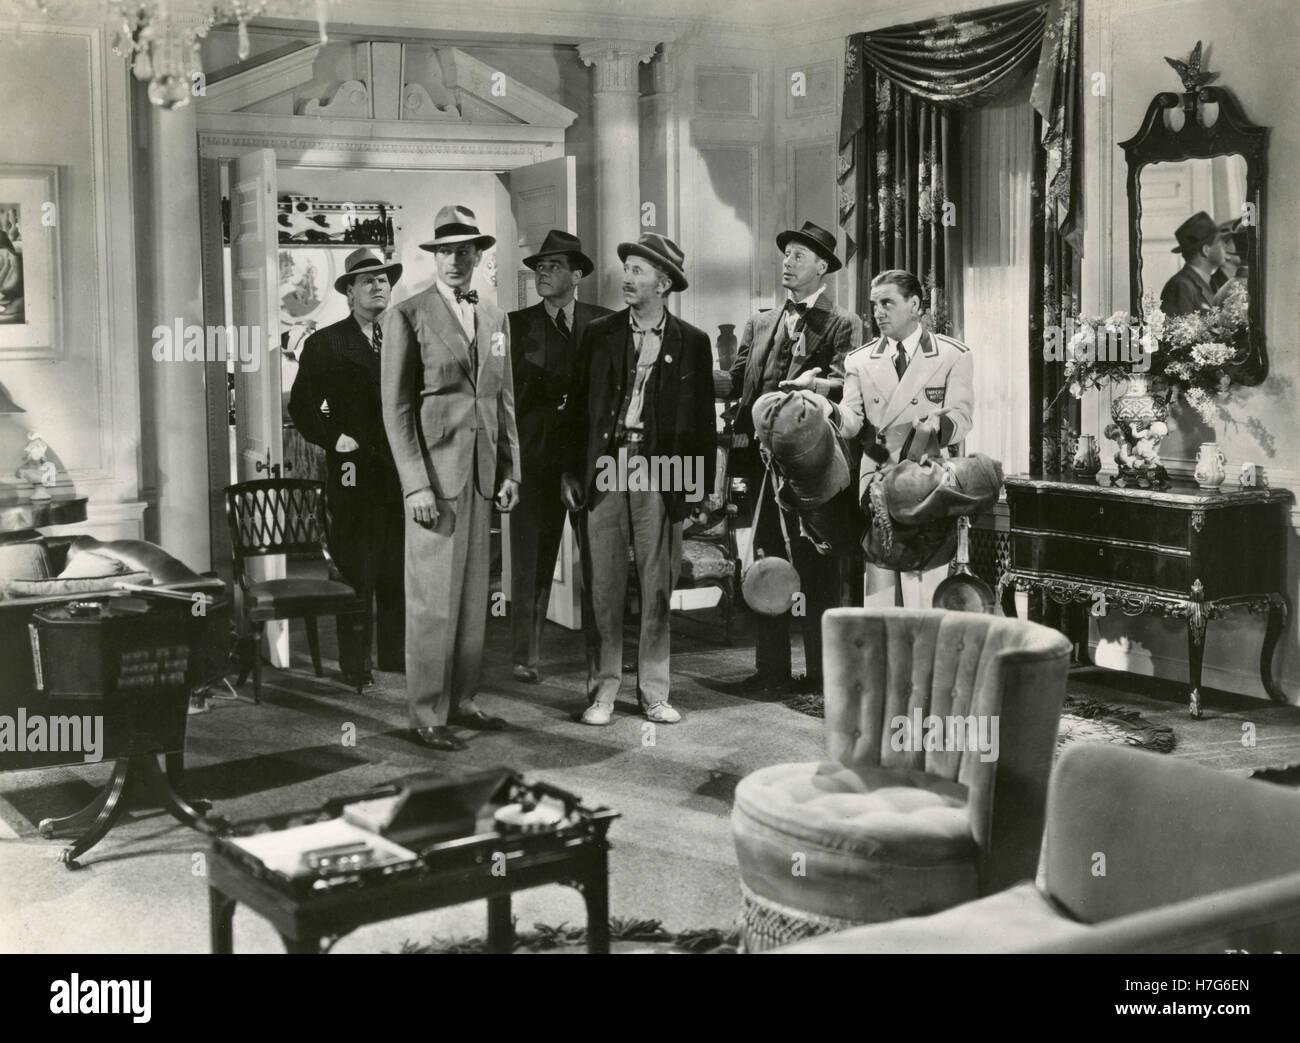 Actor Gary Cooper in the movie Meet John Doe, USA 1941 - Stock Image